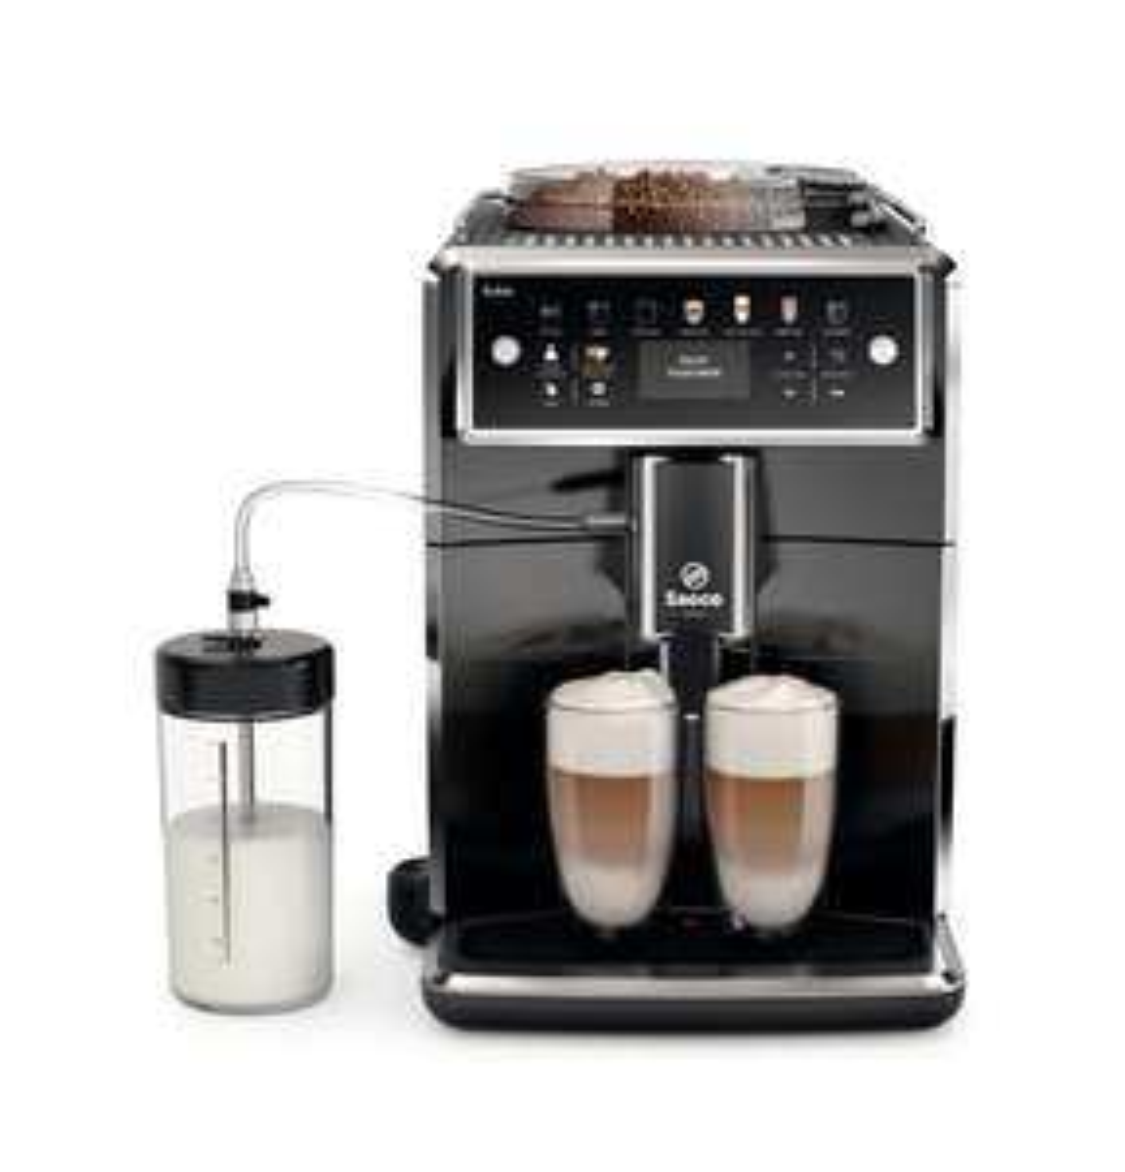 [LOKAL Saturn] Saeco SM7580 Xelsis Kaffeevollautomat 5 Jahre Garantie